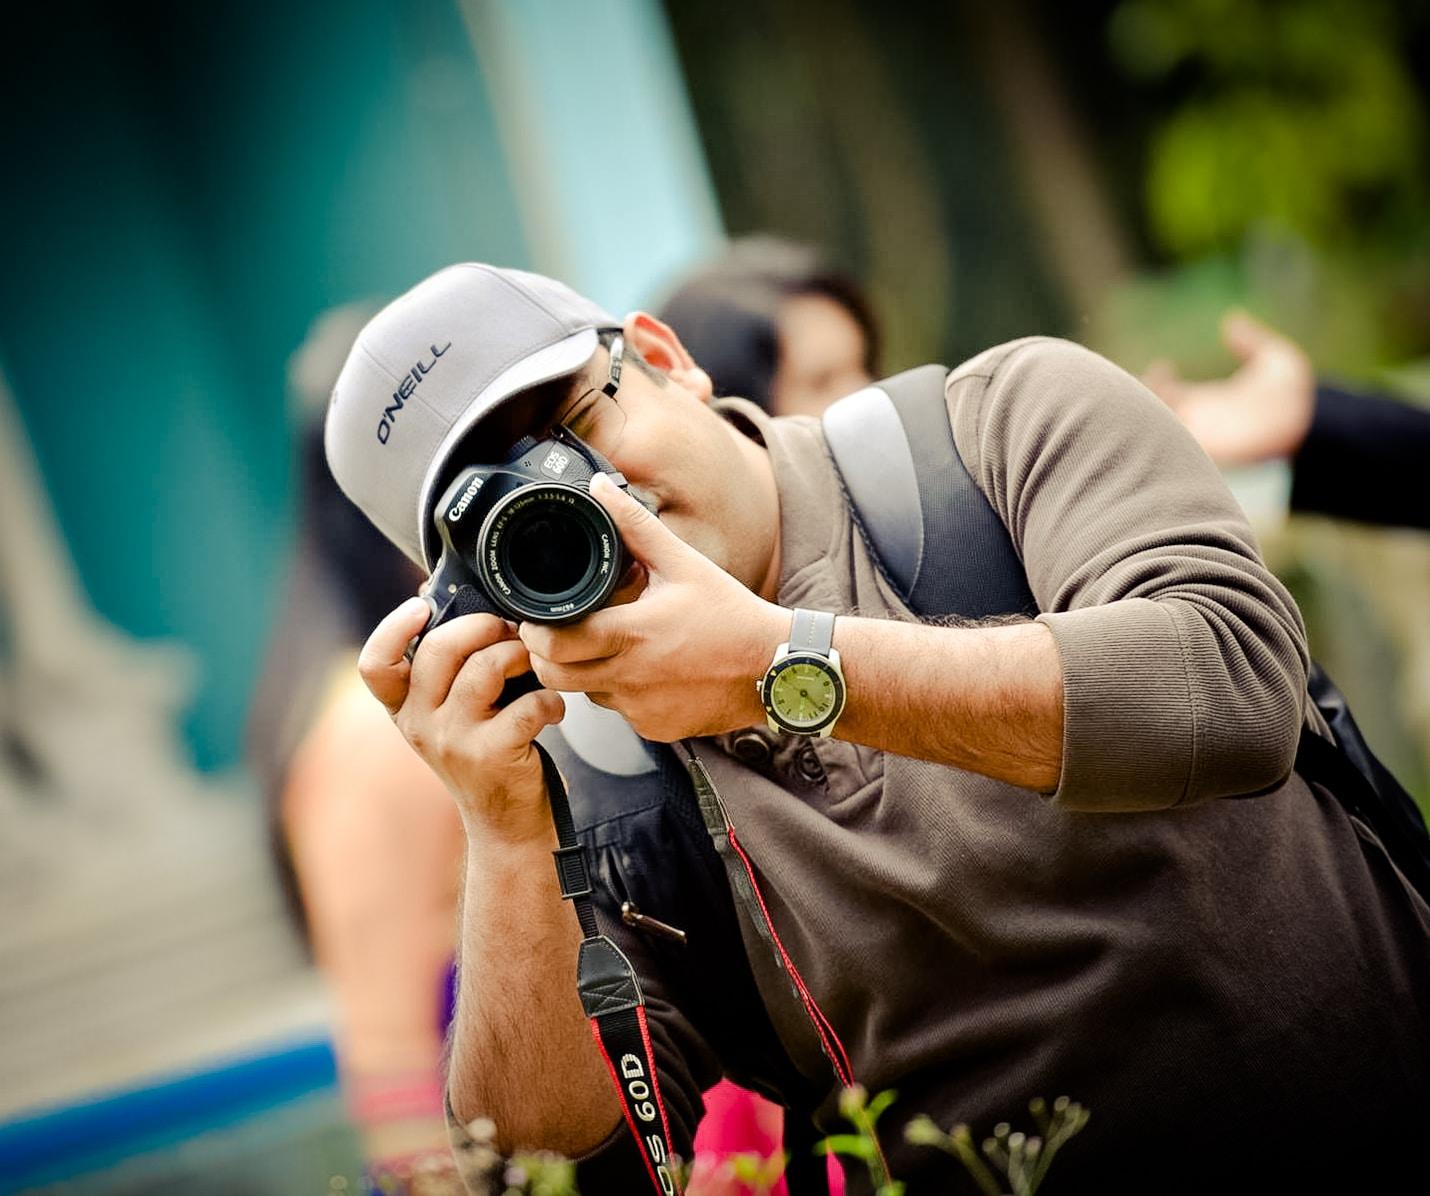 Go to Sazzad Mahmud's profile